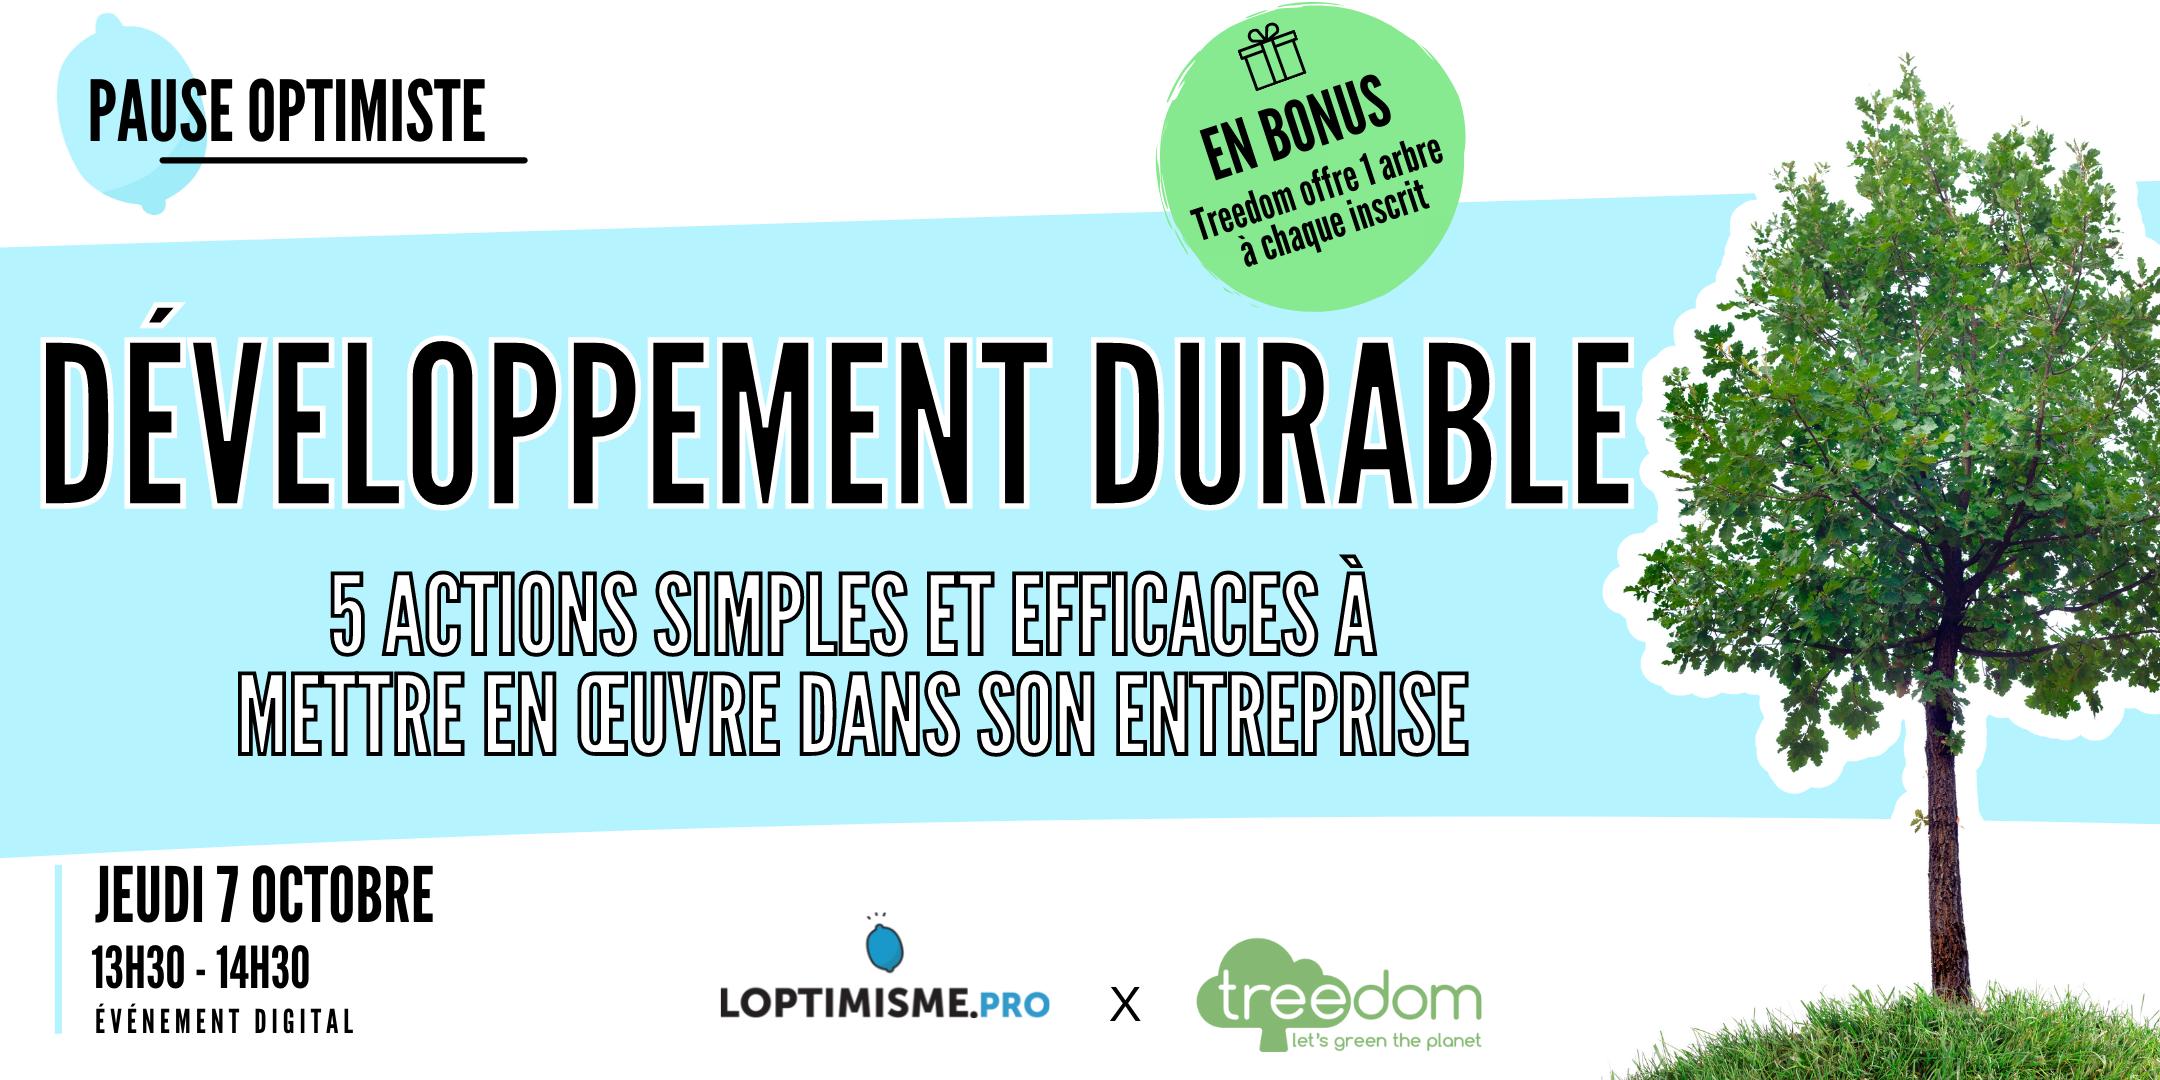 Pause optimiste Developpement durable treedom 07.10.21